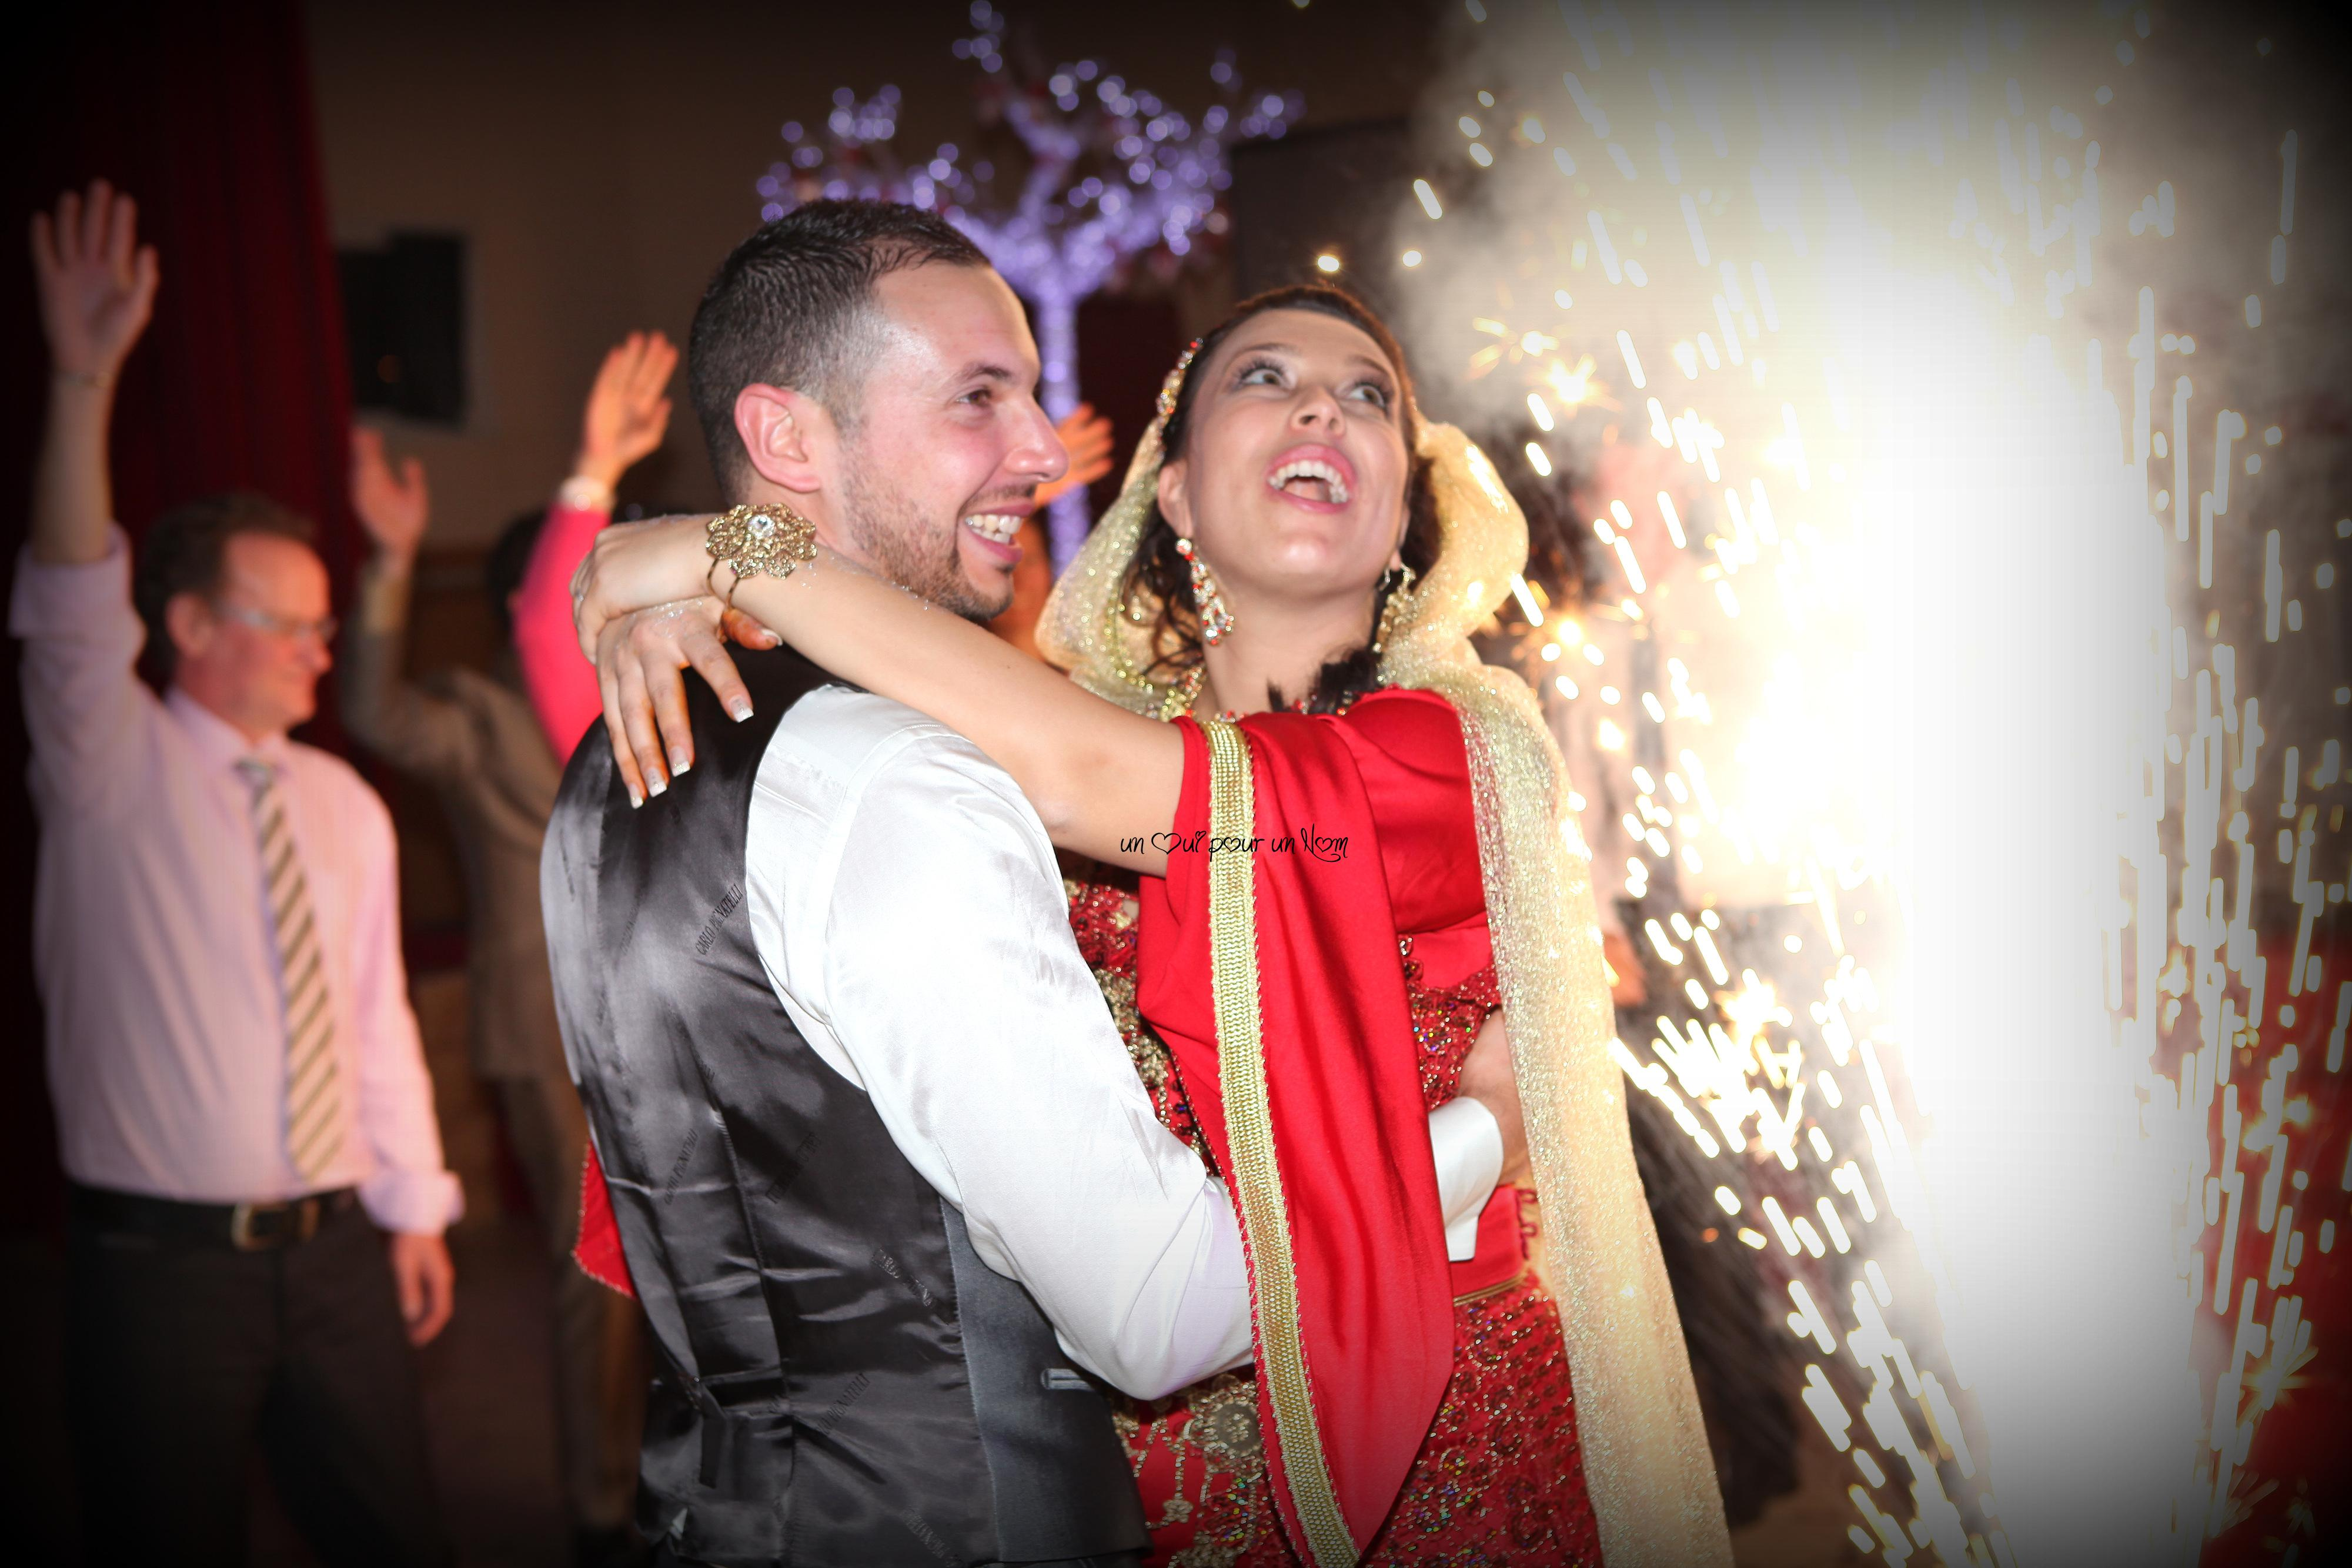 photographe cameraman mariage oriental slow - Photographe Mariage Oriental